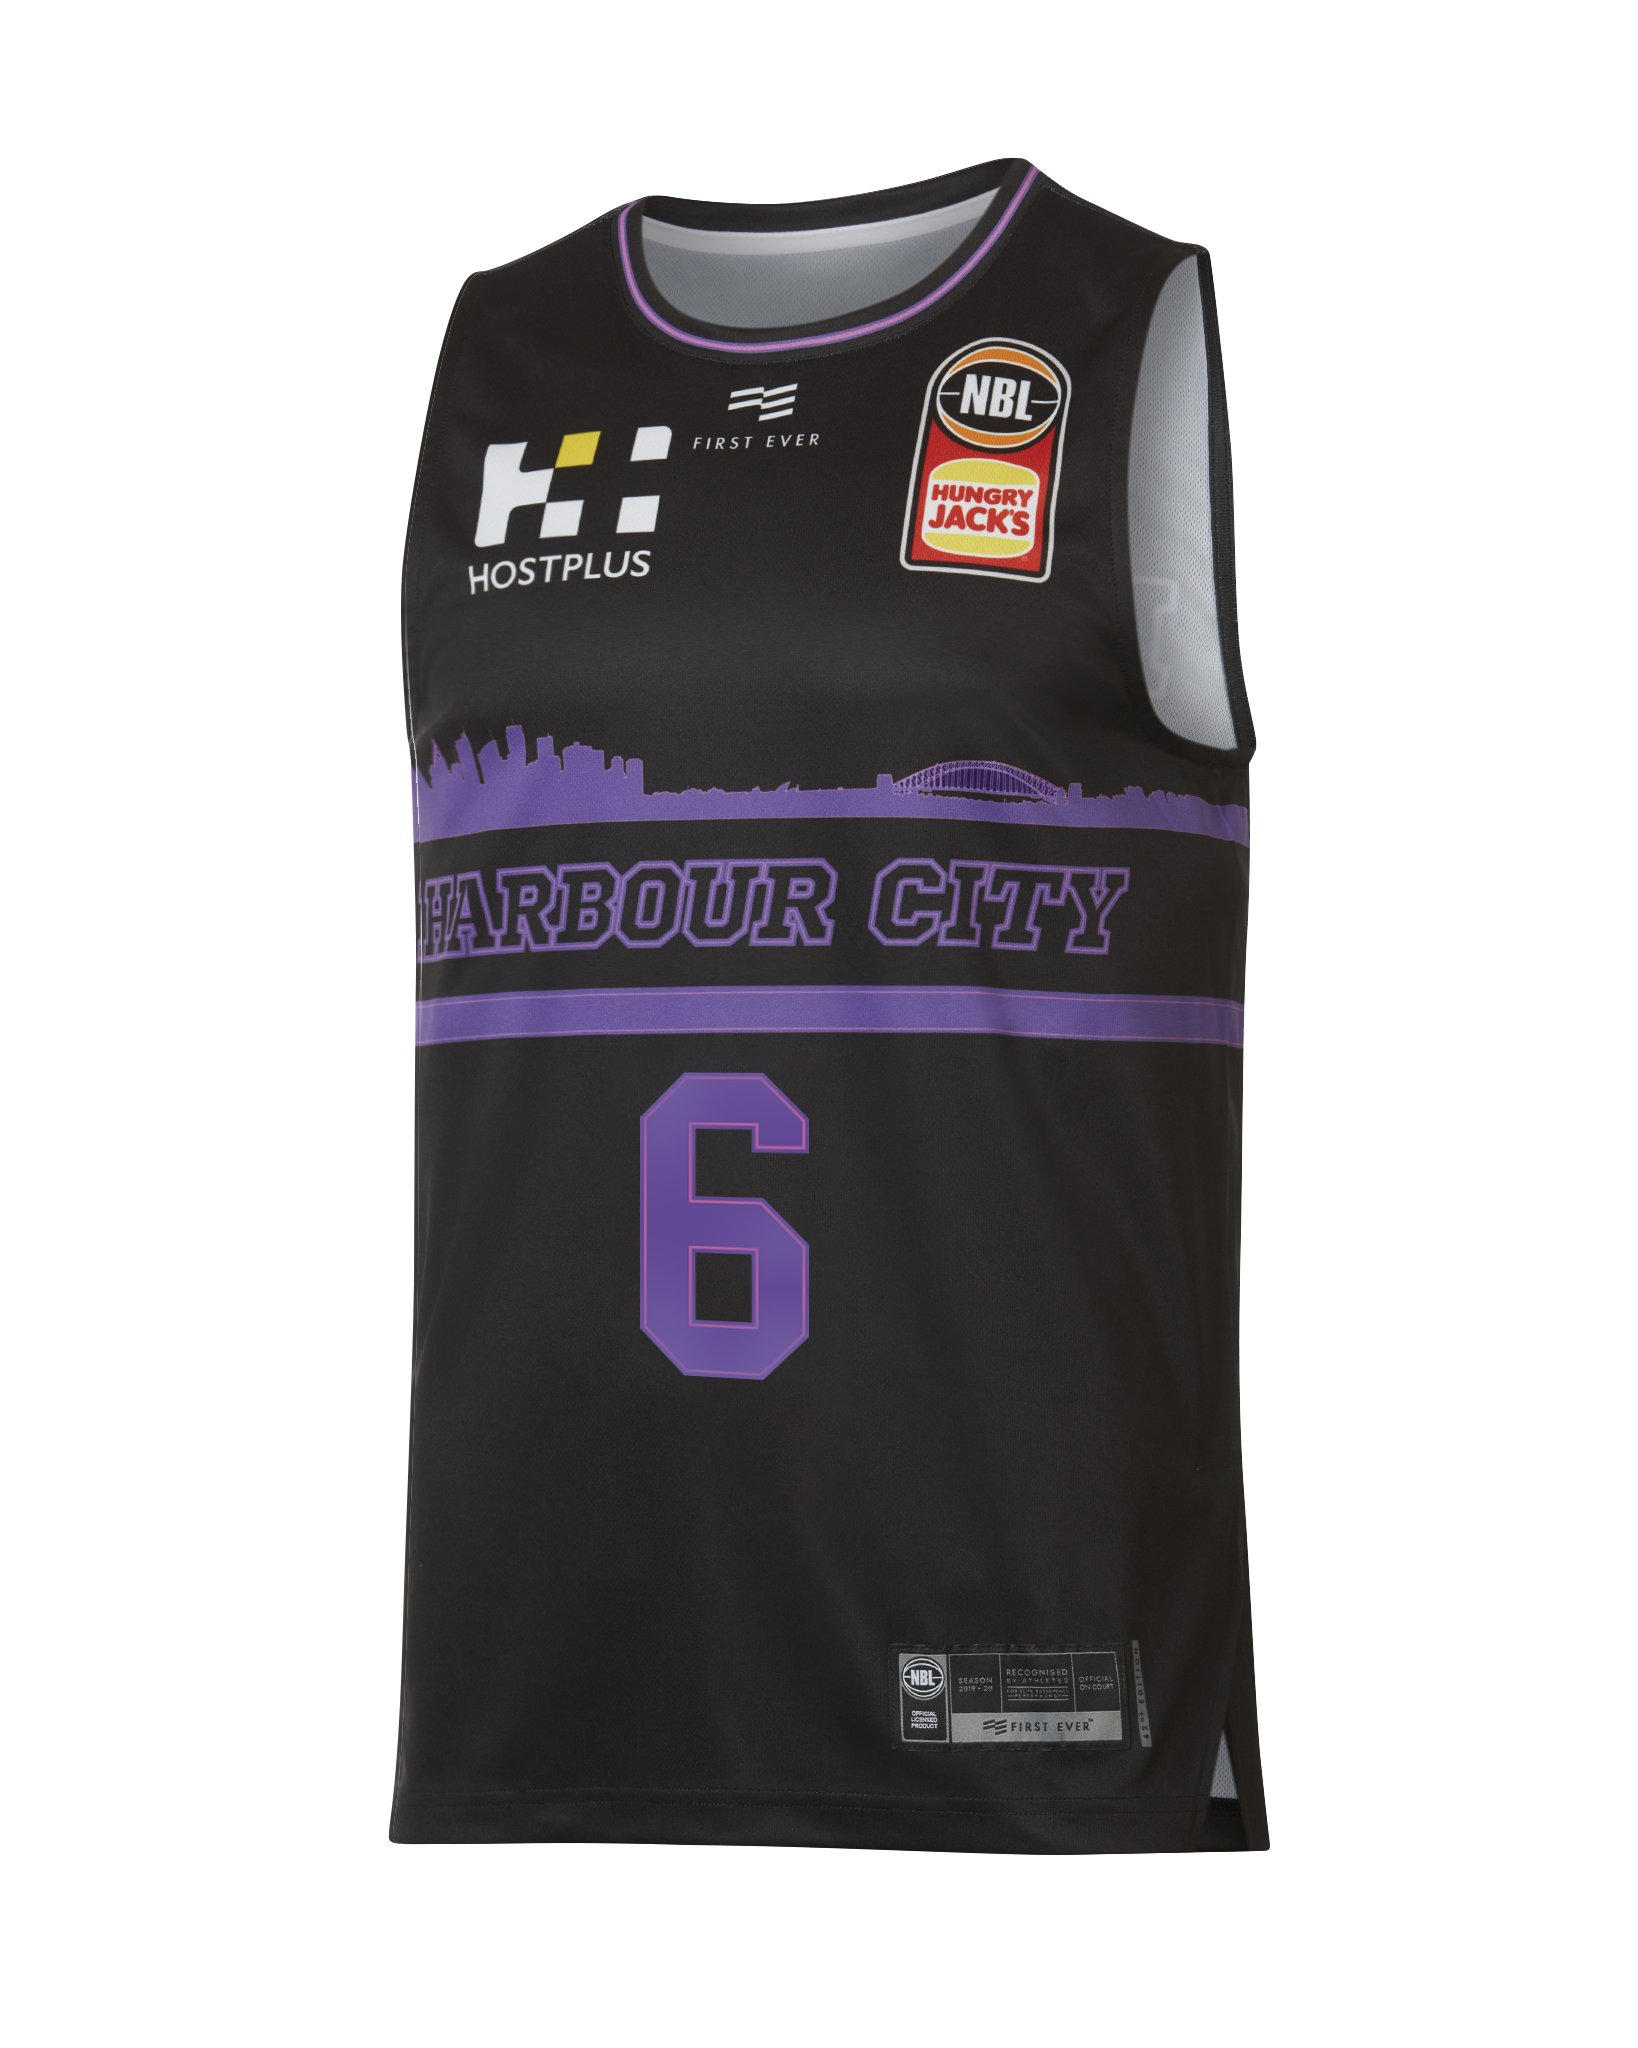 buy cheap jerseys online china